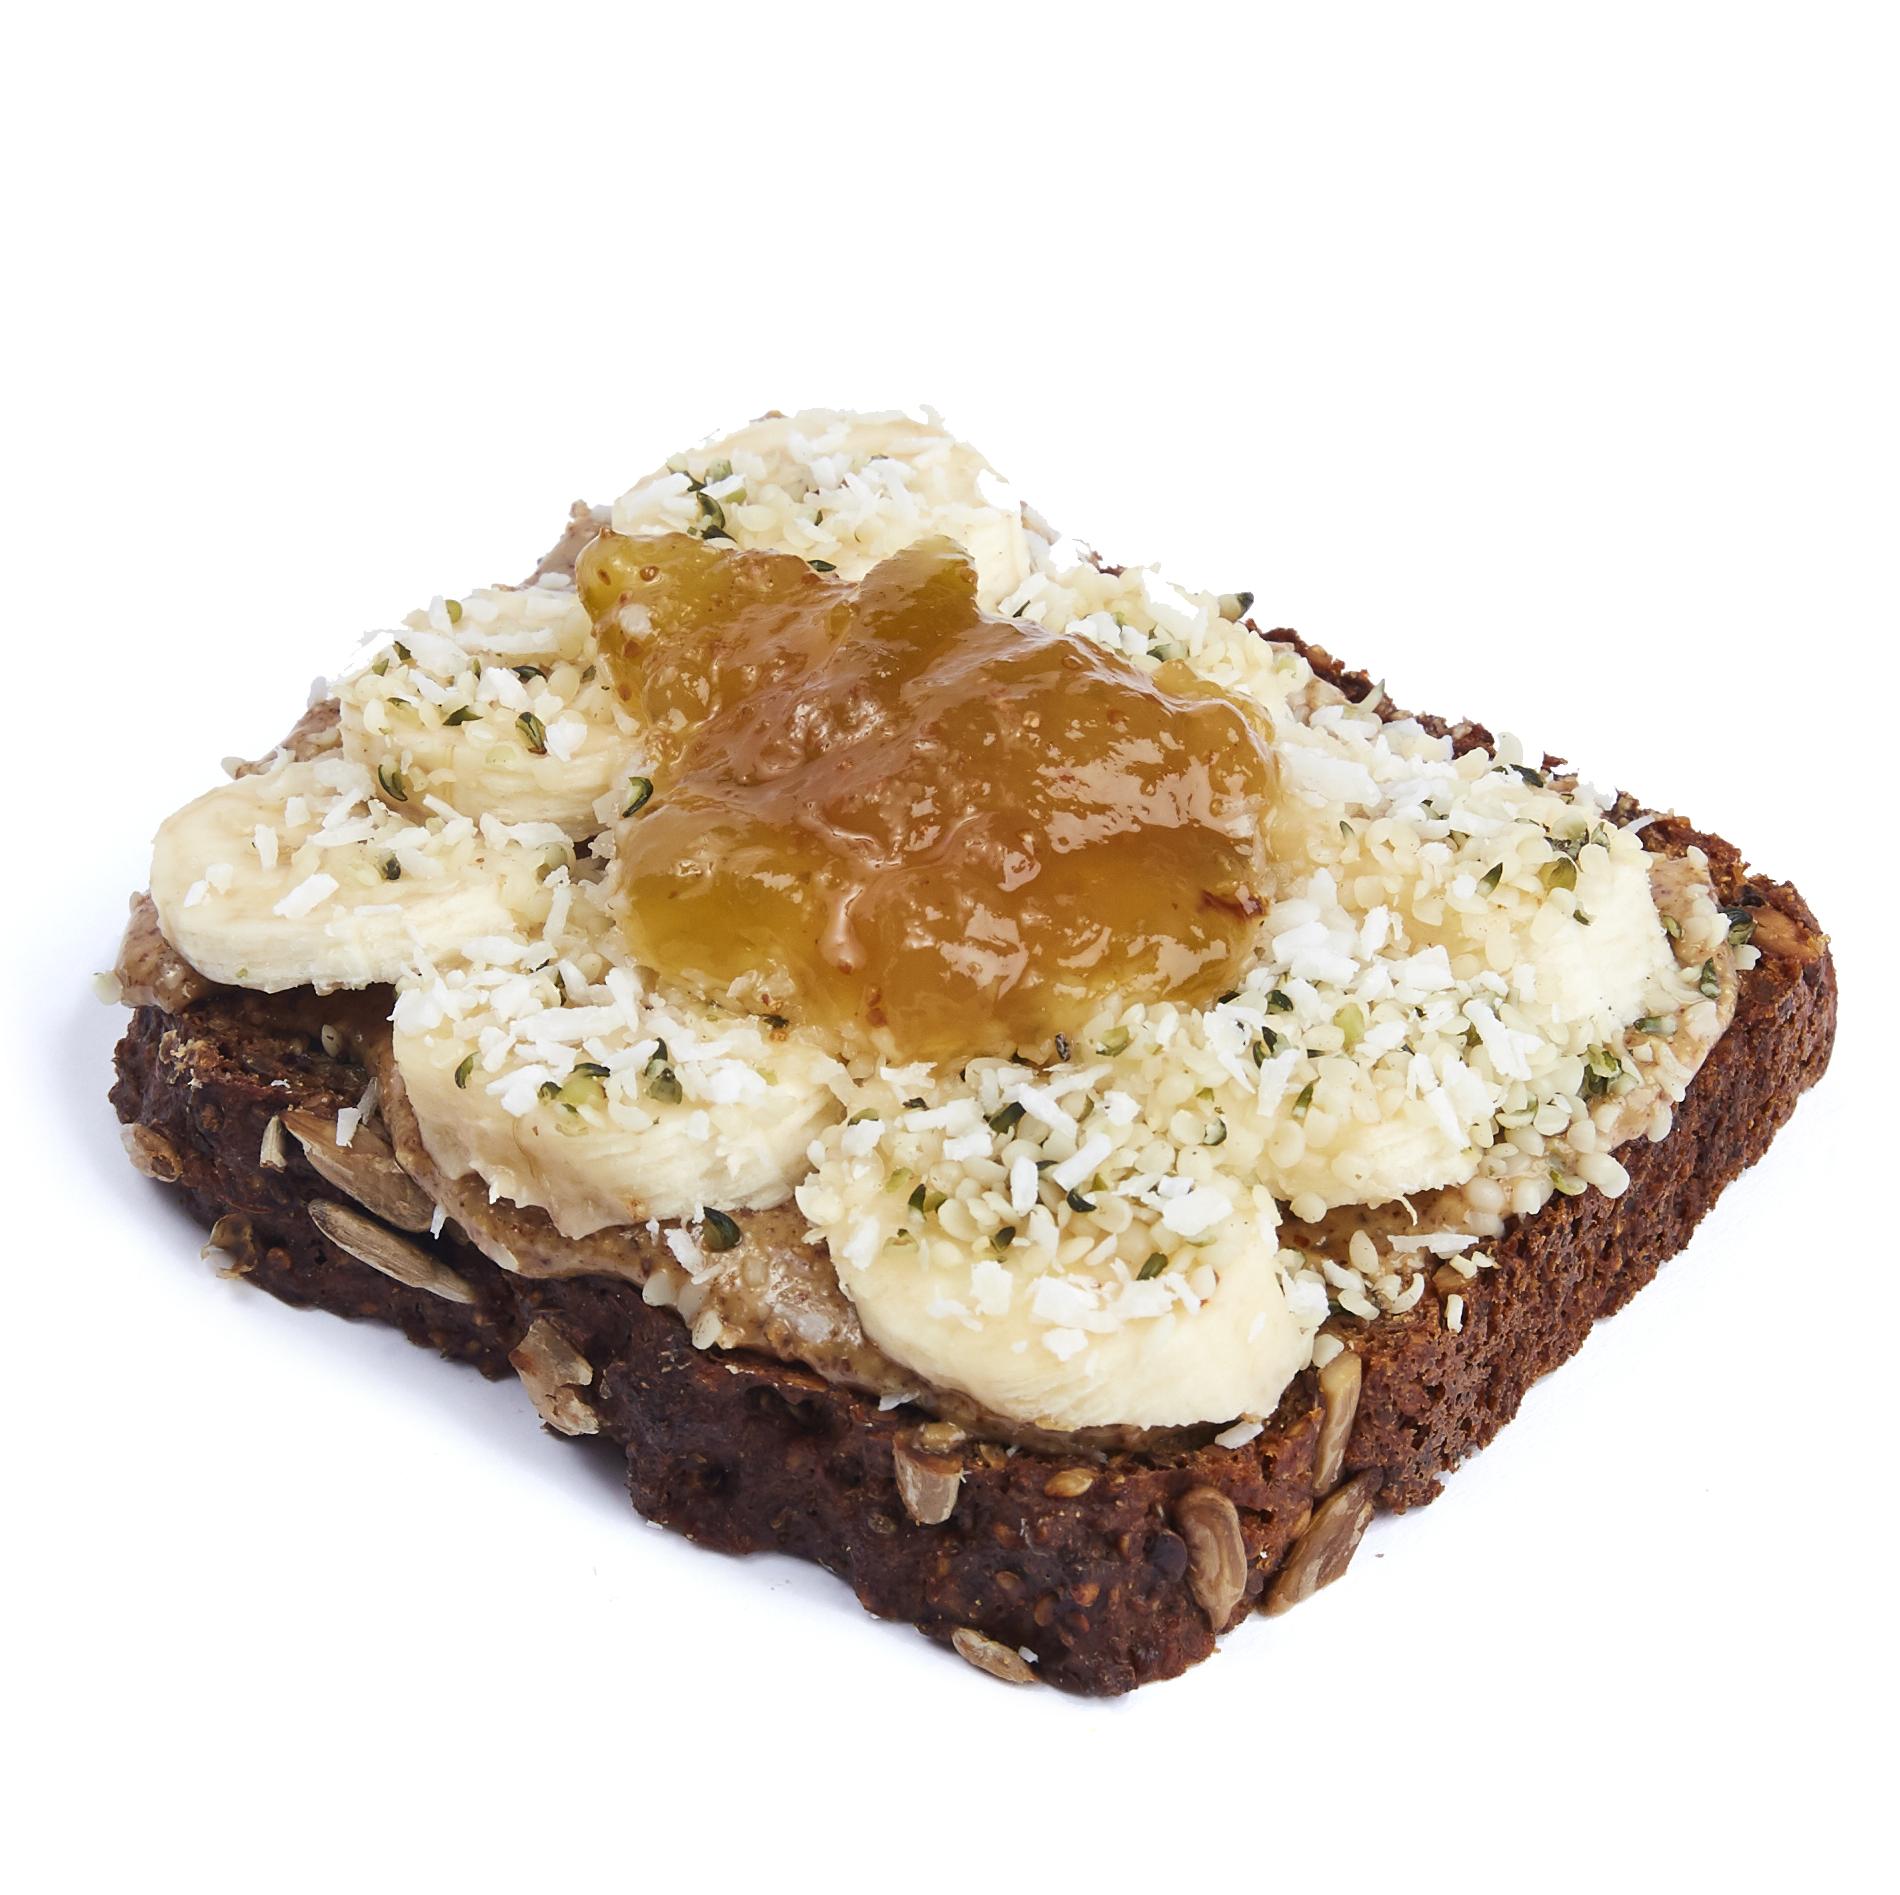 Almond butter and royal fig tartine - $10.99  Almond butter, banana, hempseed, shredded coconut, royal fig jam